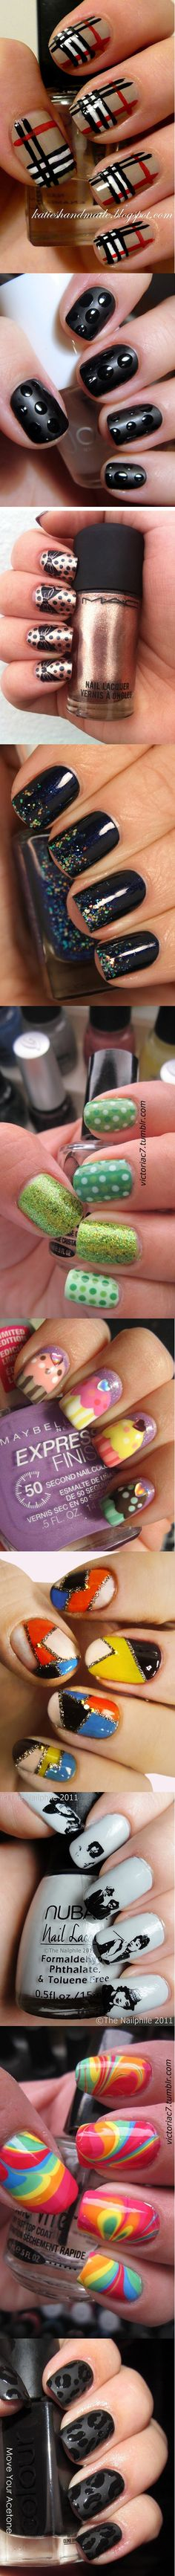 My 10 favorite nail designs on my nail board...so far :-)